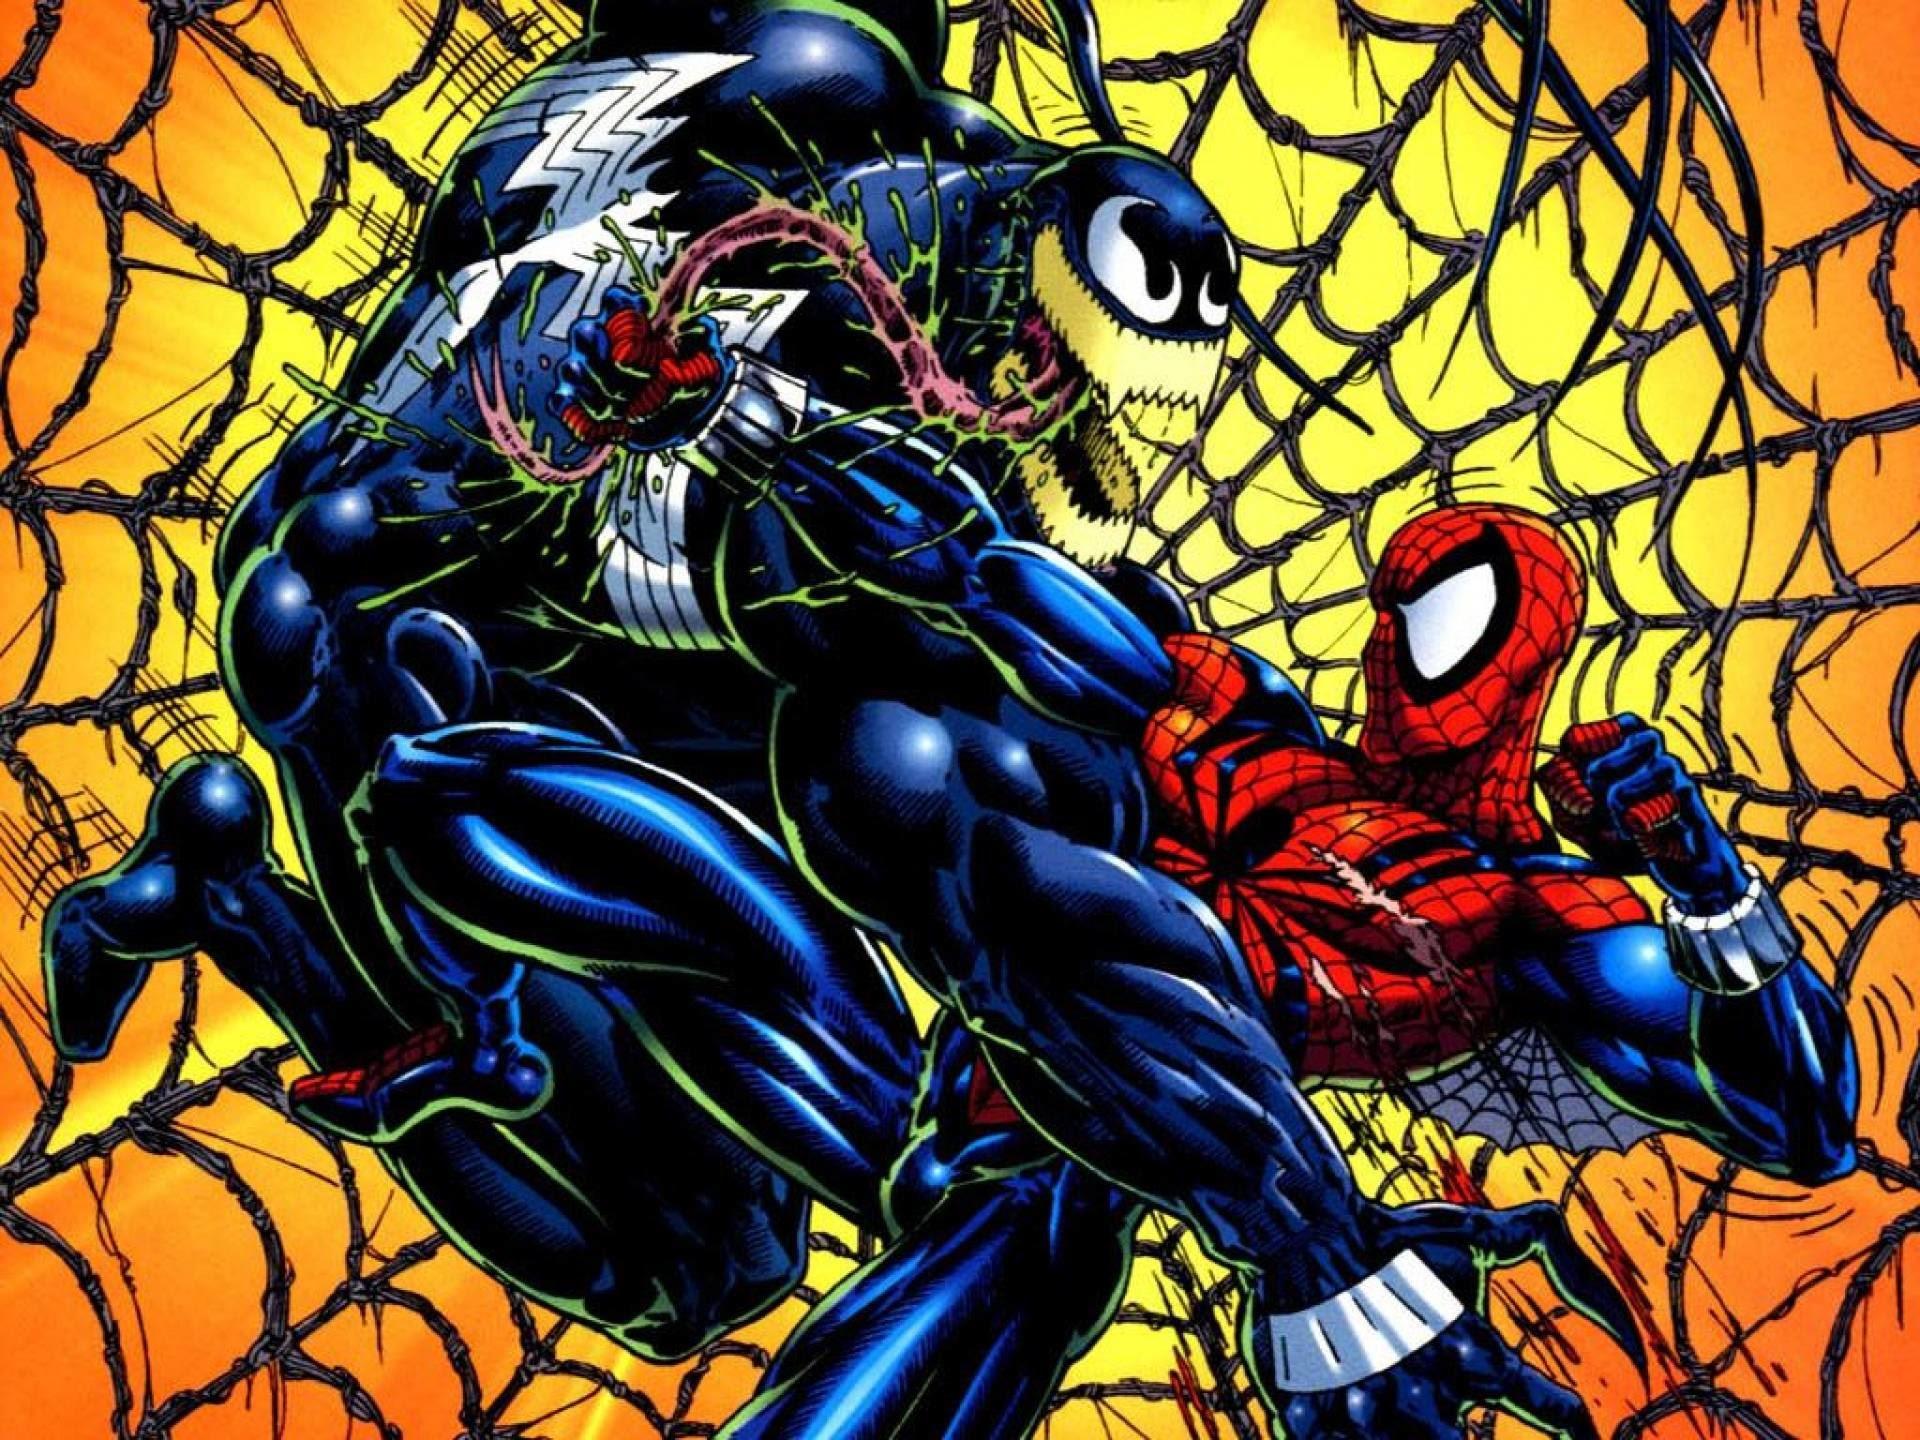 Hd Comic Book Wallpaper 75 Images